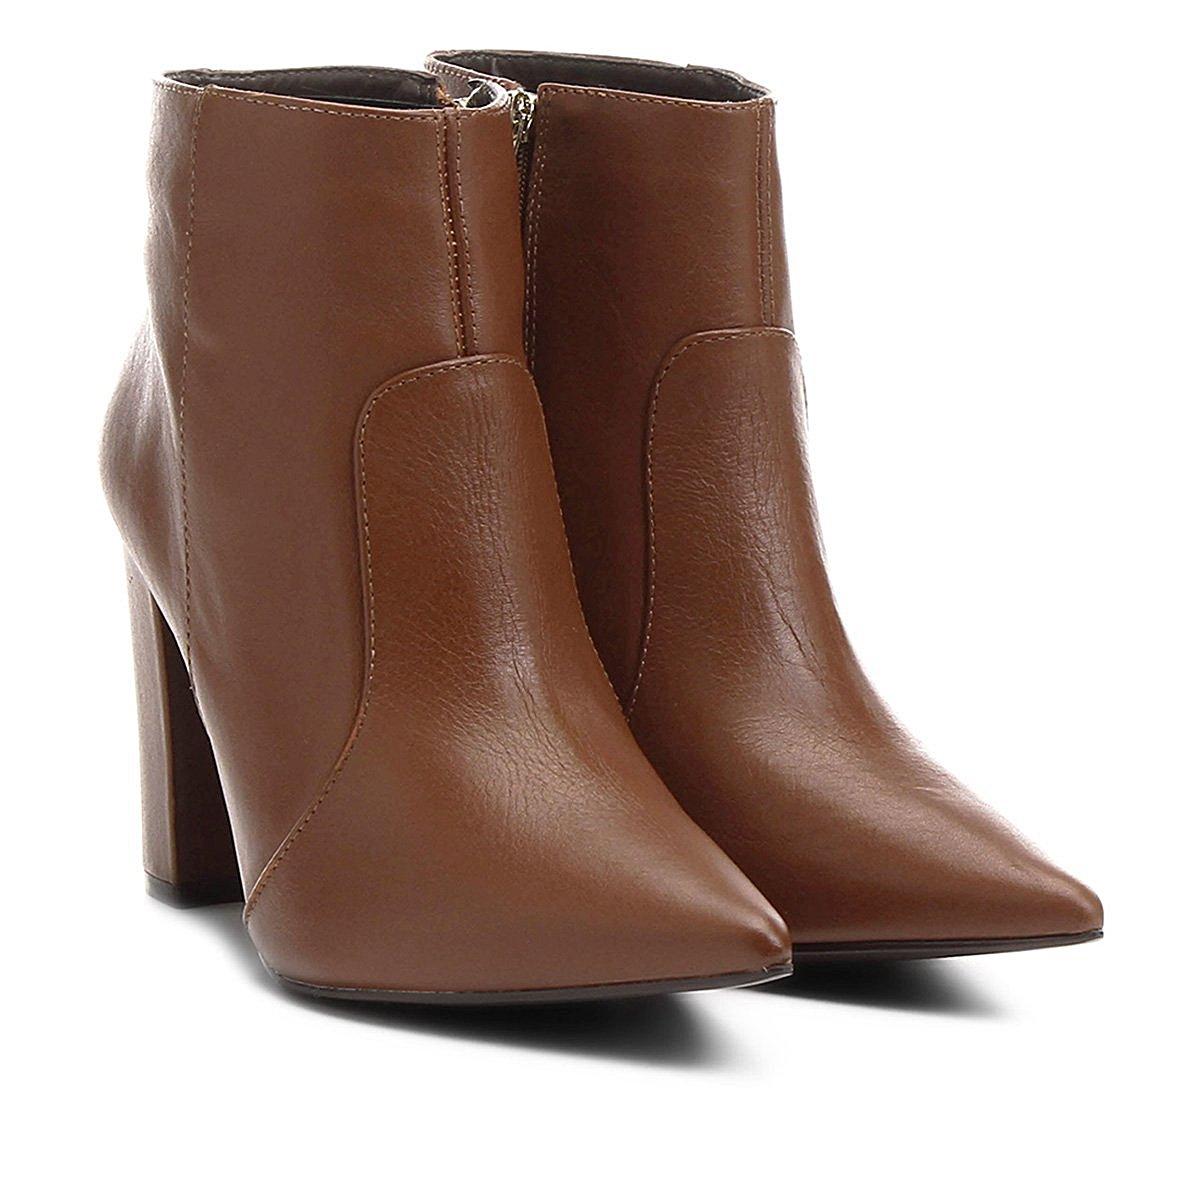 f6c7c61346 ... Bota Couro Shoestock Curta Bico Fino Salto Grosso Feminina